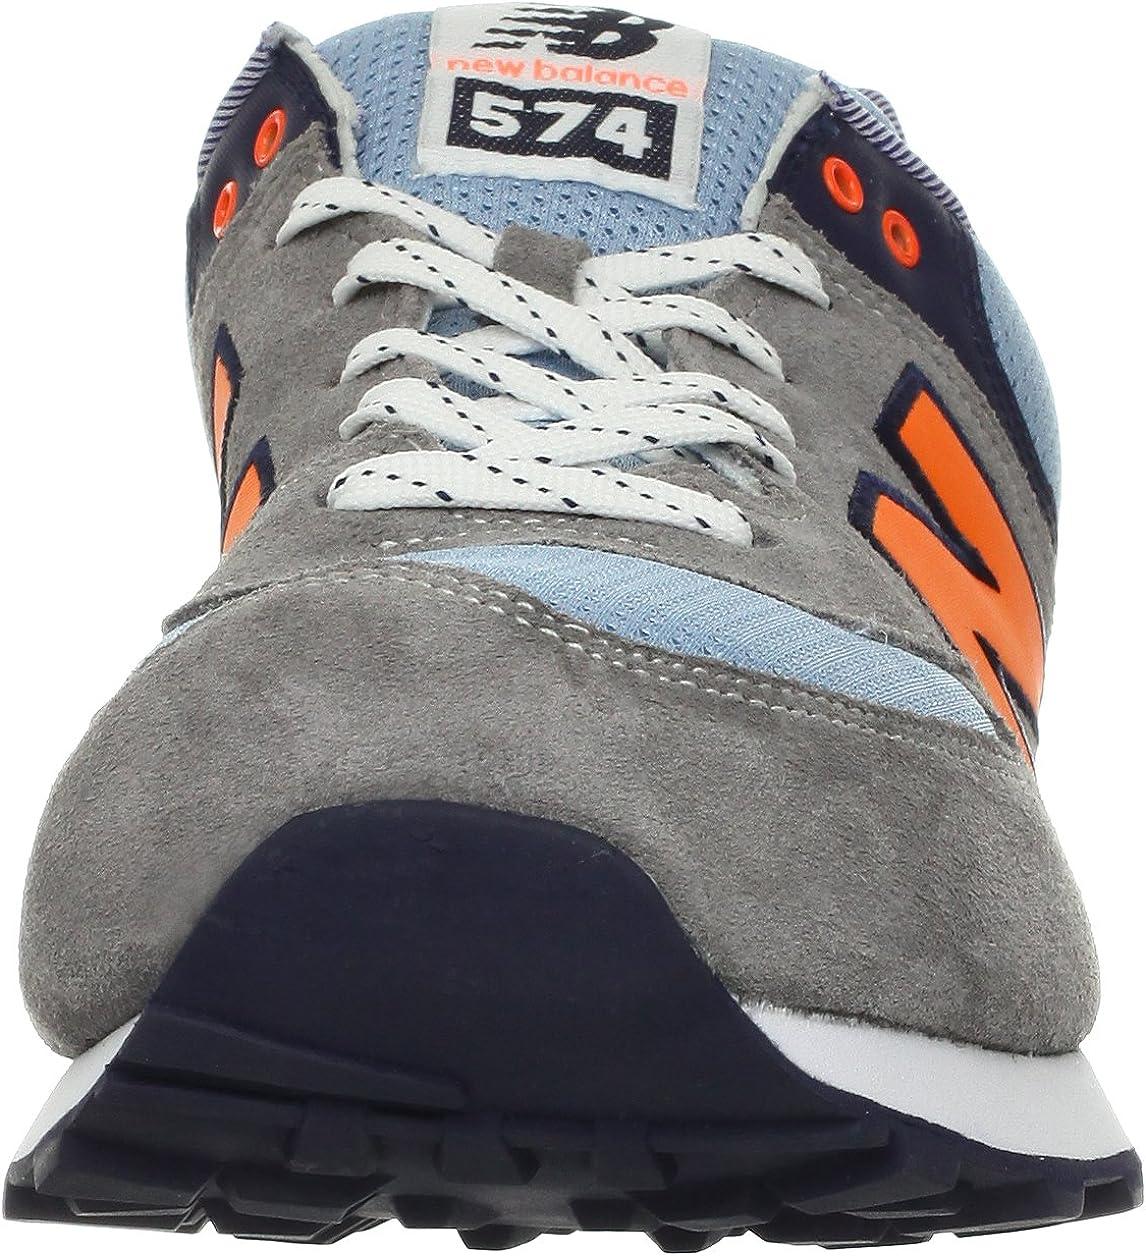 new balance 574 grigio arancione